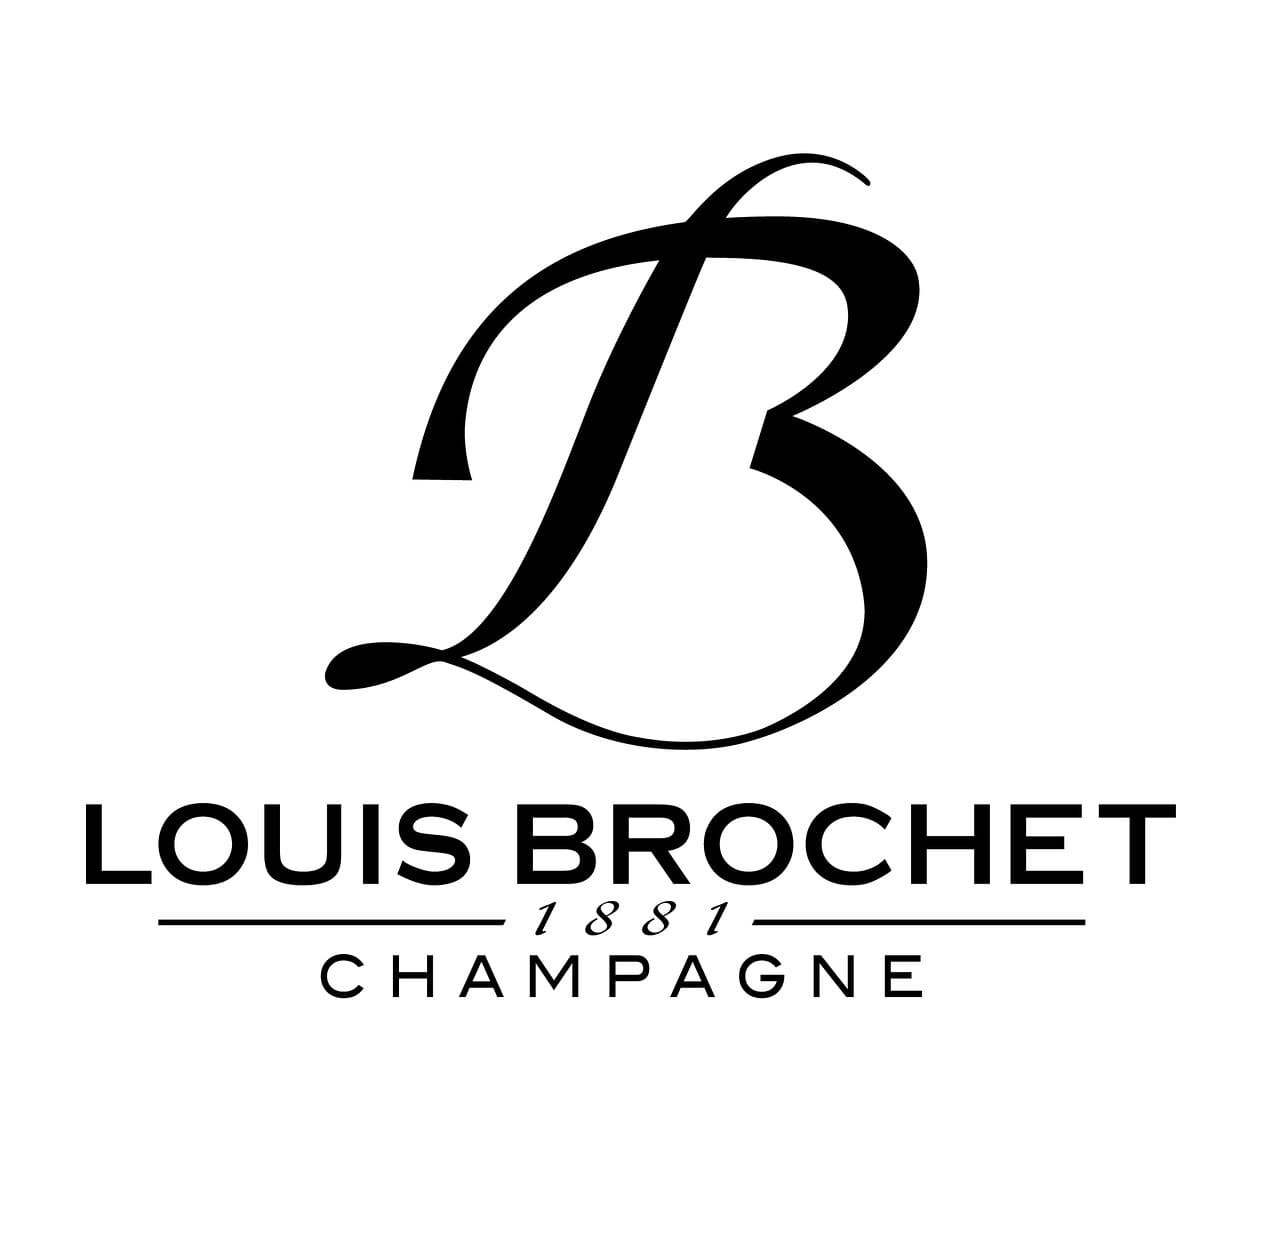 Maison Louis Brochet